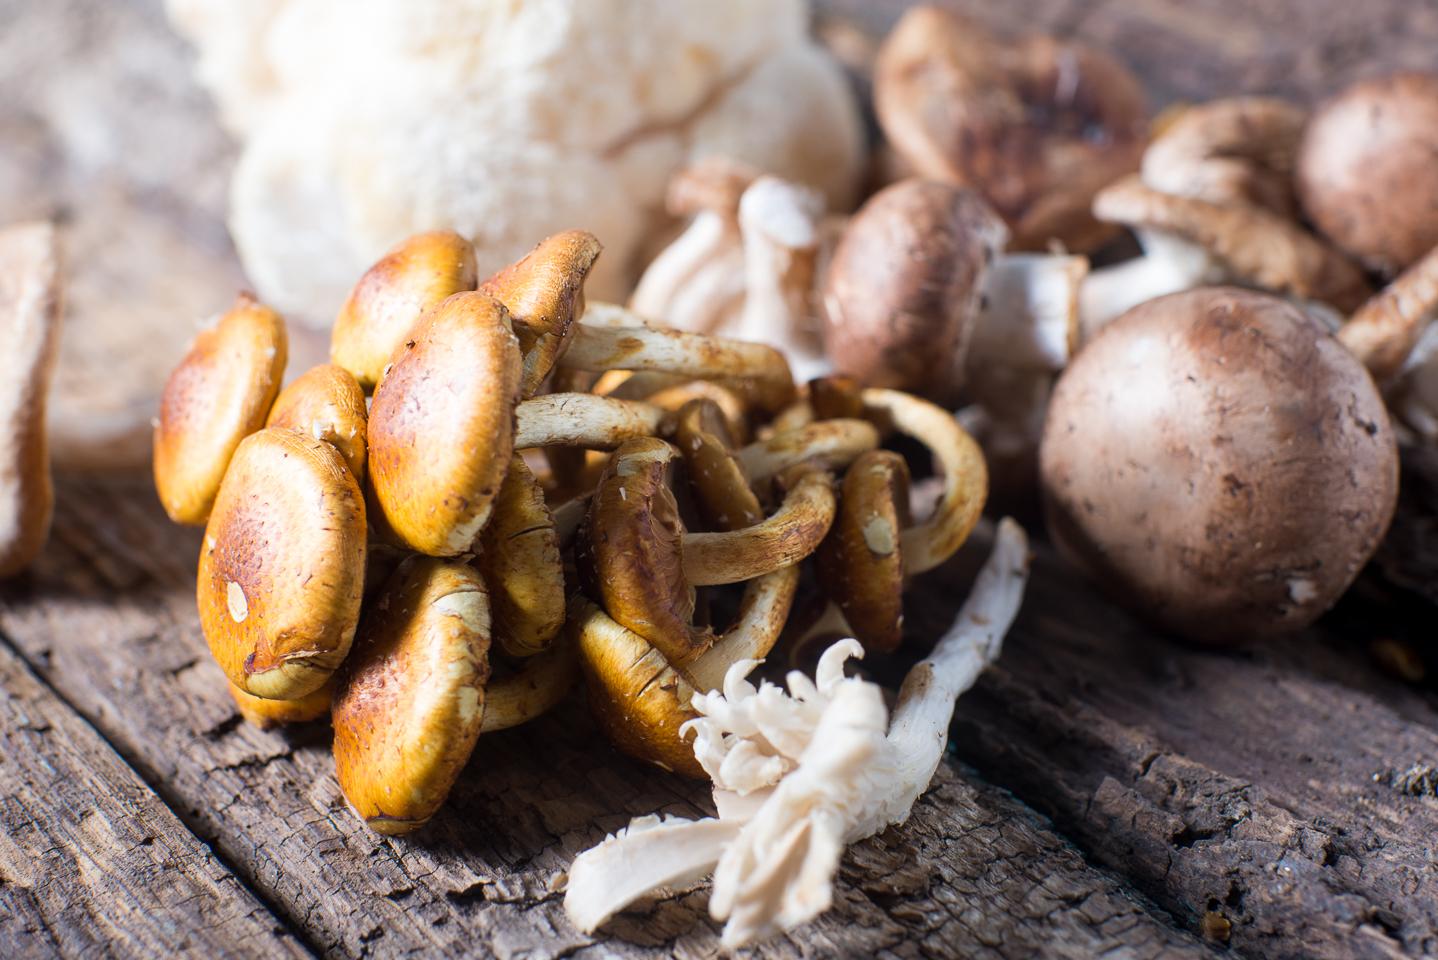 Edible Assortment of Wild Colorado Mushrooms